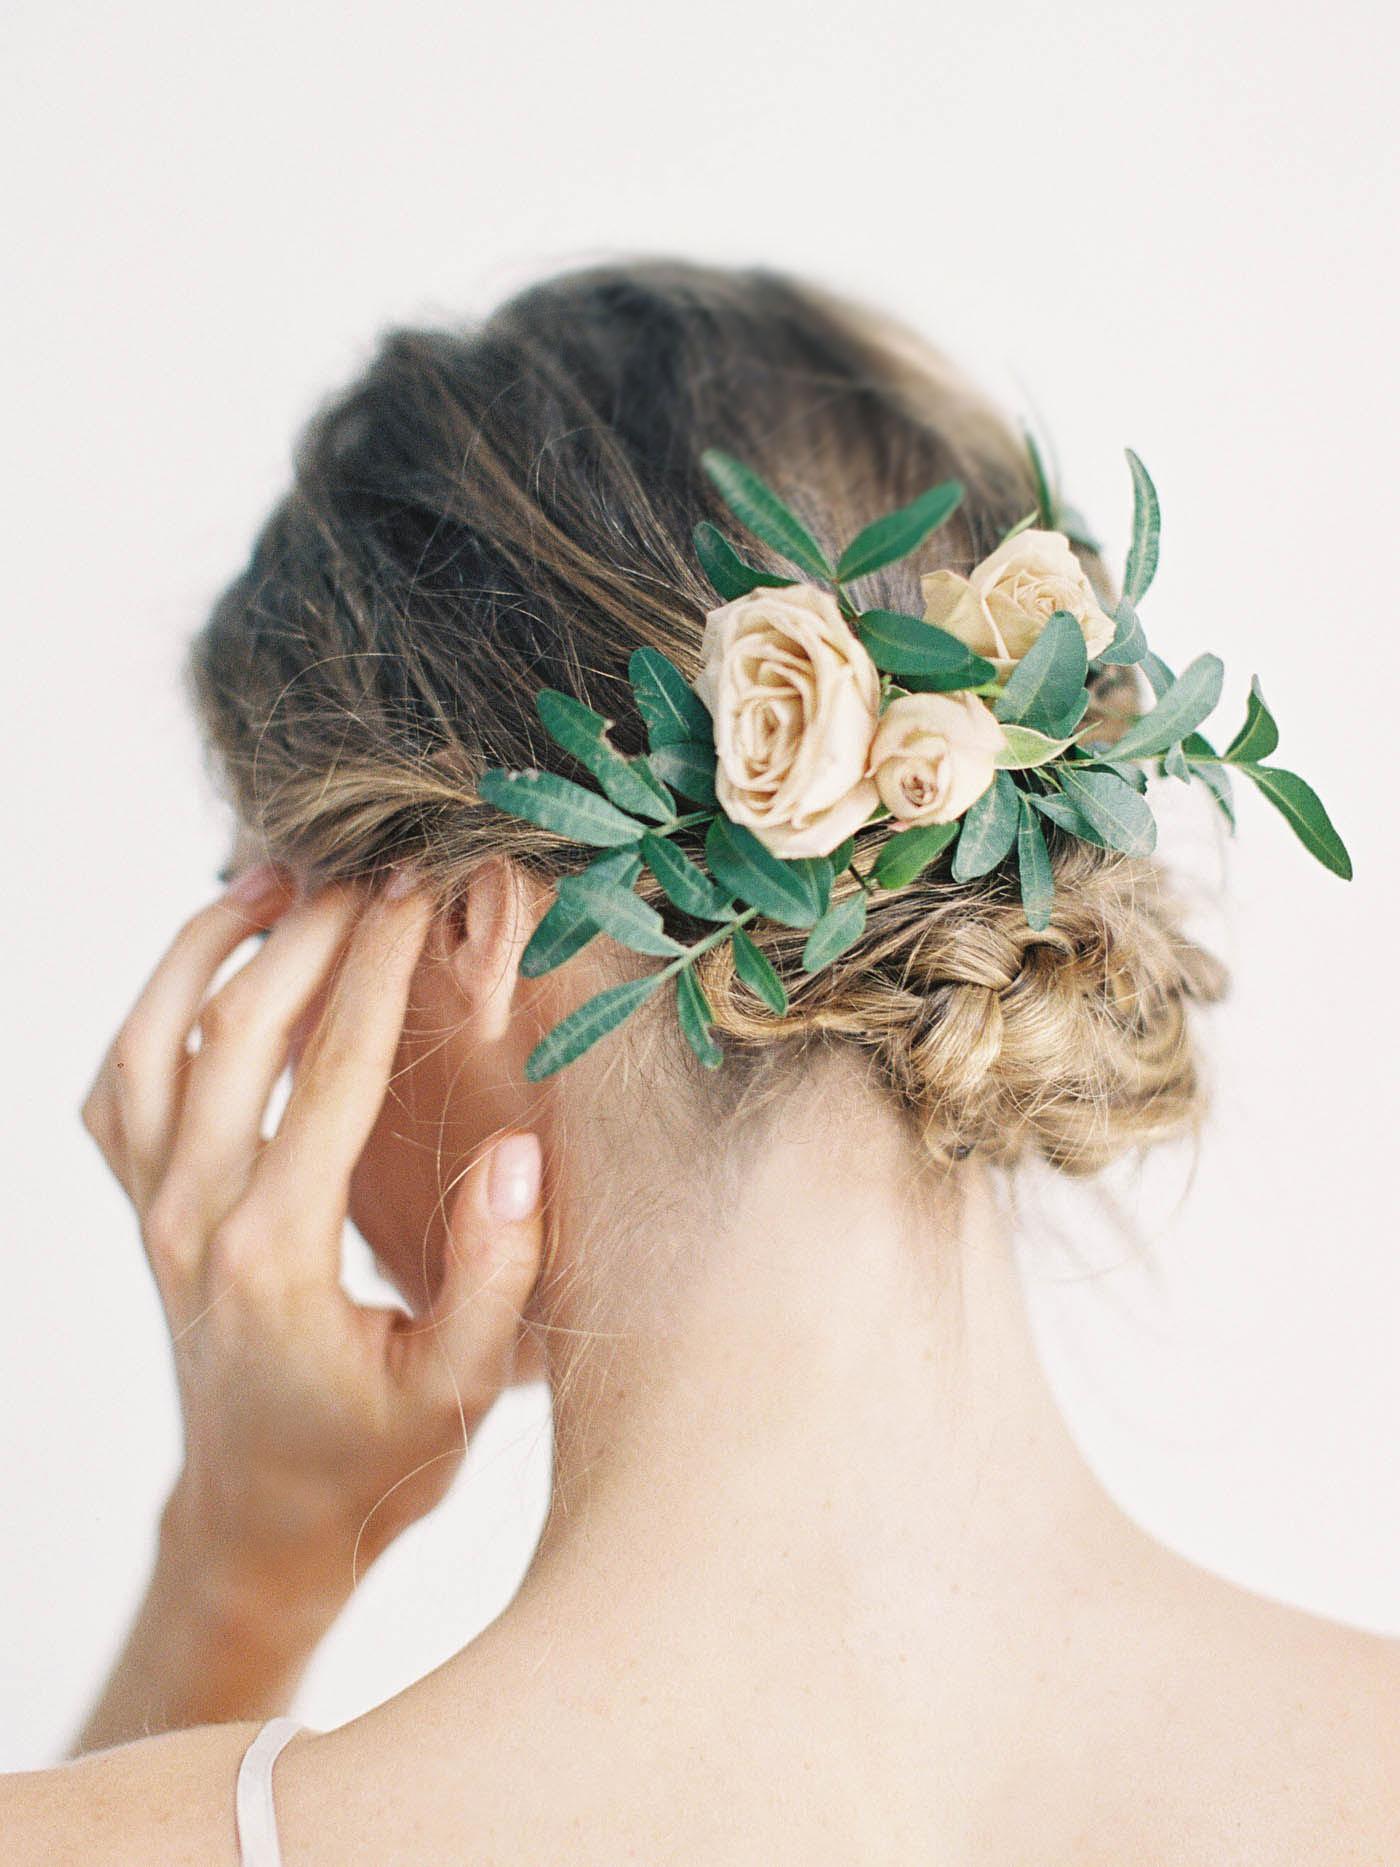 floral-crown-10-Jen_Huang-006838-R1-E002.jpg